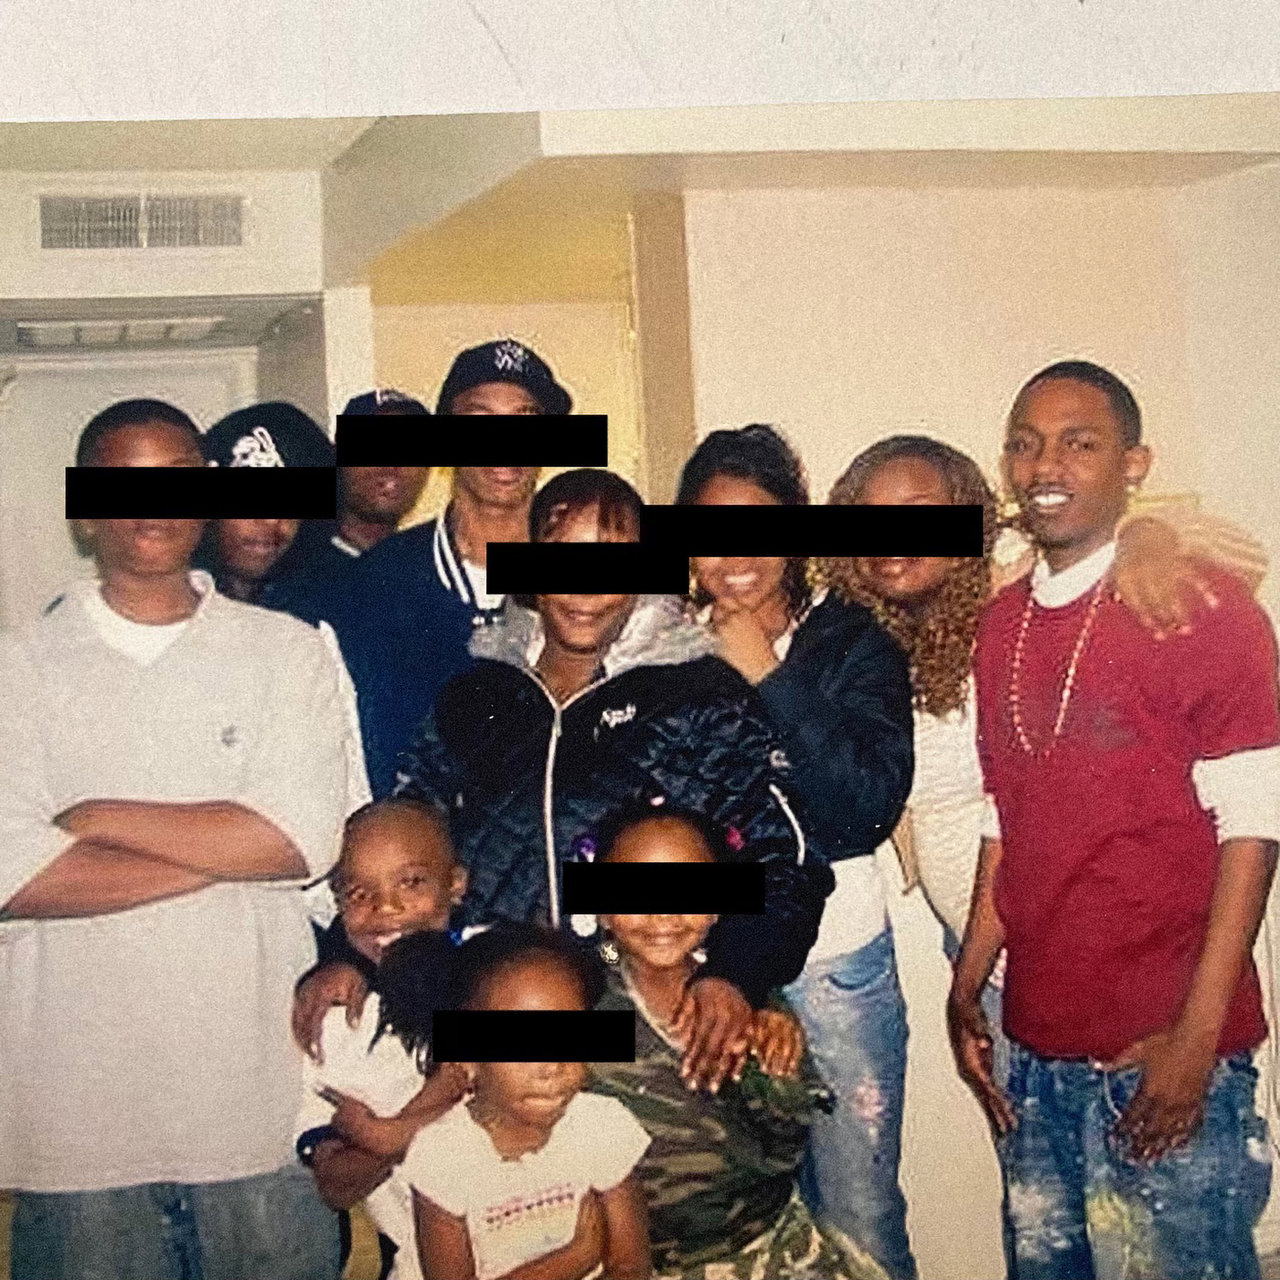 Baby Keem - Family Ties (ft. Kendrick Lamar) (Cover)